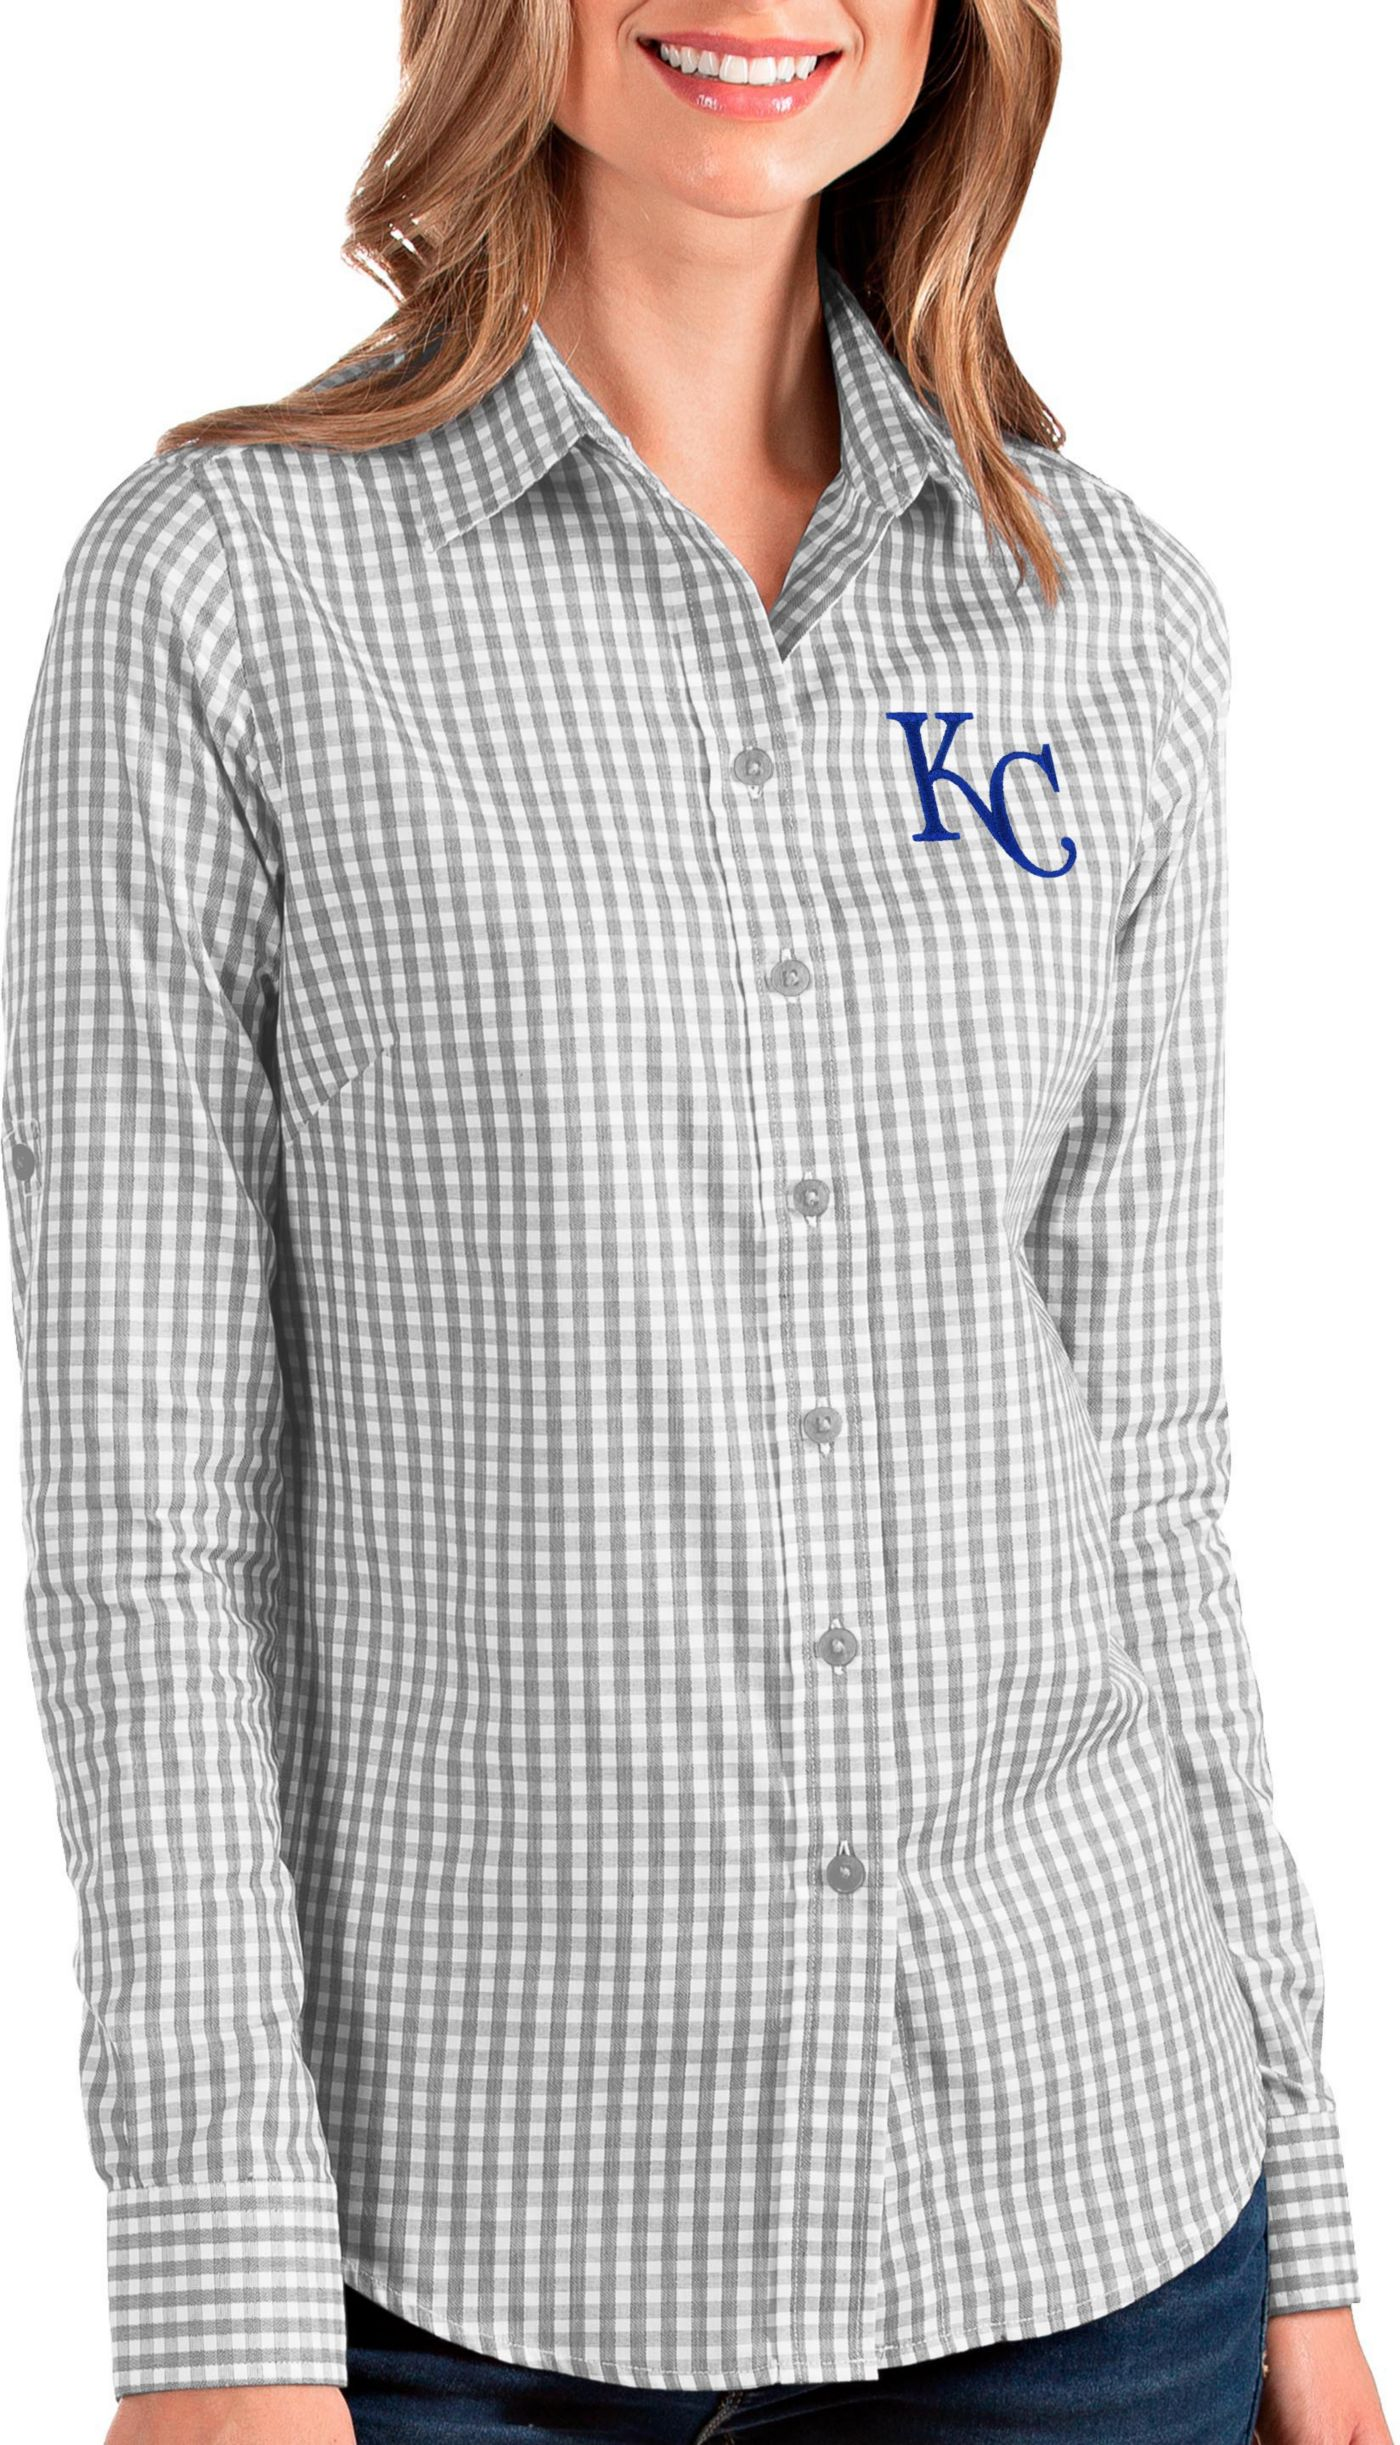 Antigua Women's Kansas City Royals Structure Button-Up Grey Long Sleeve Shirt